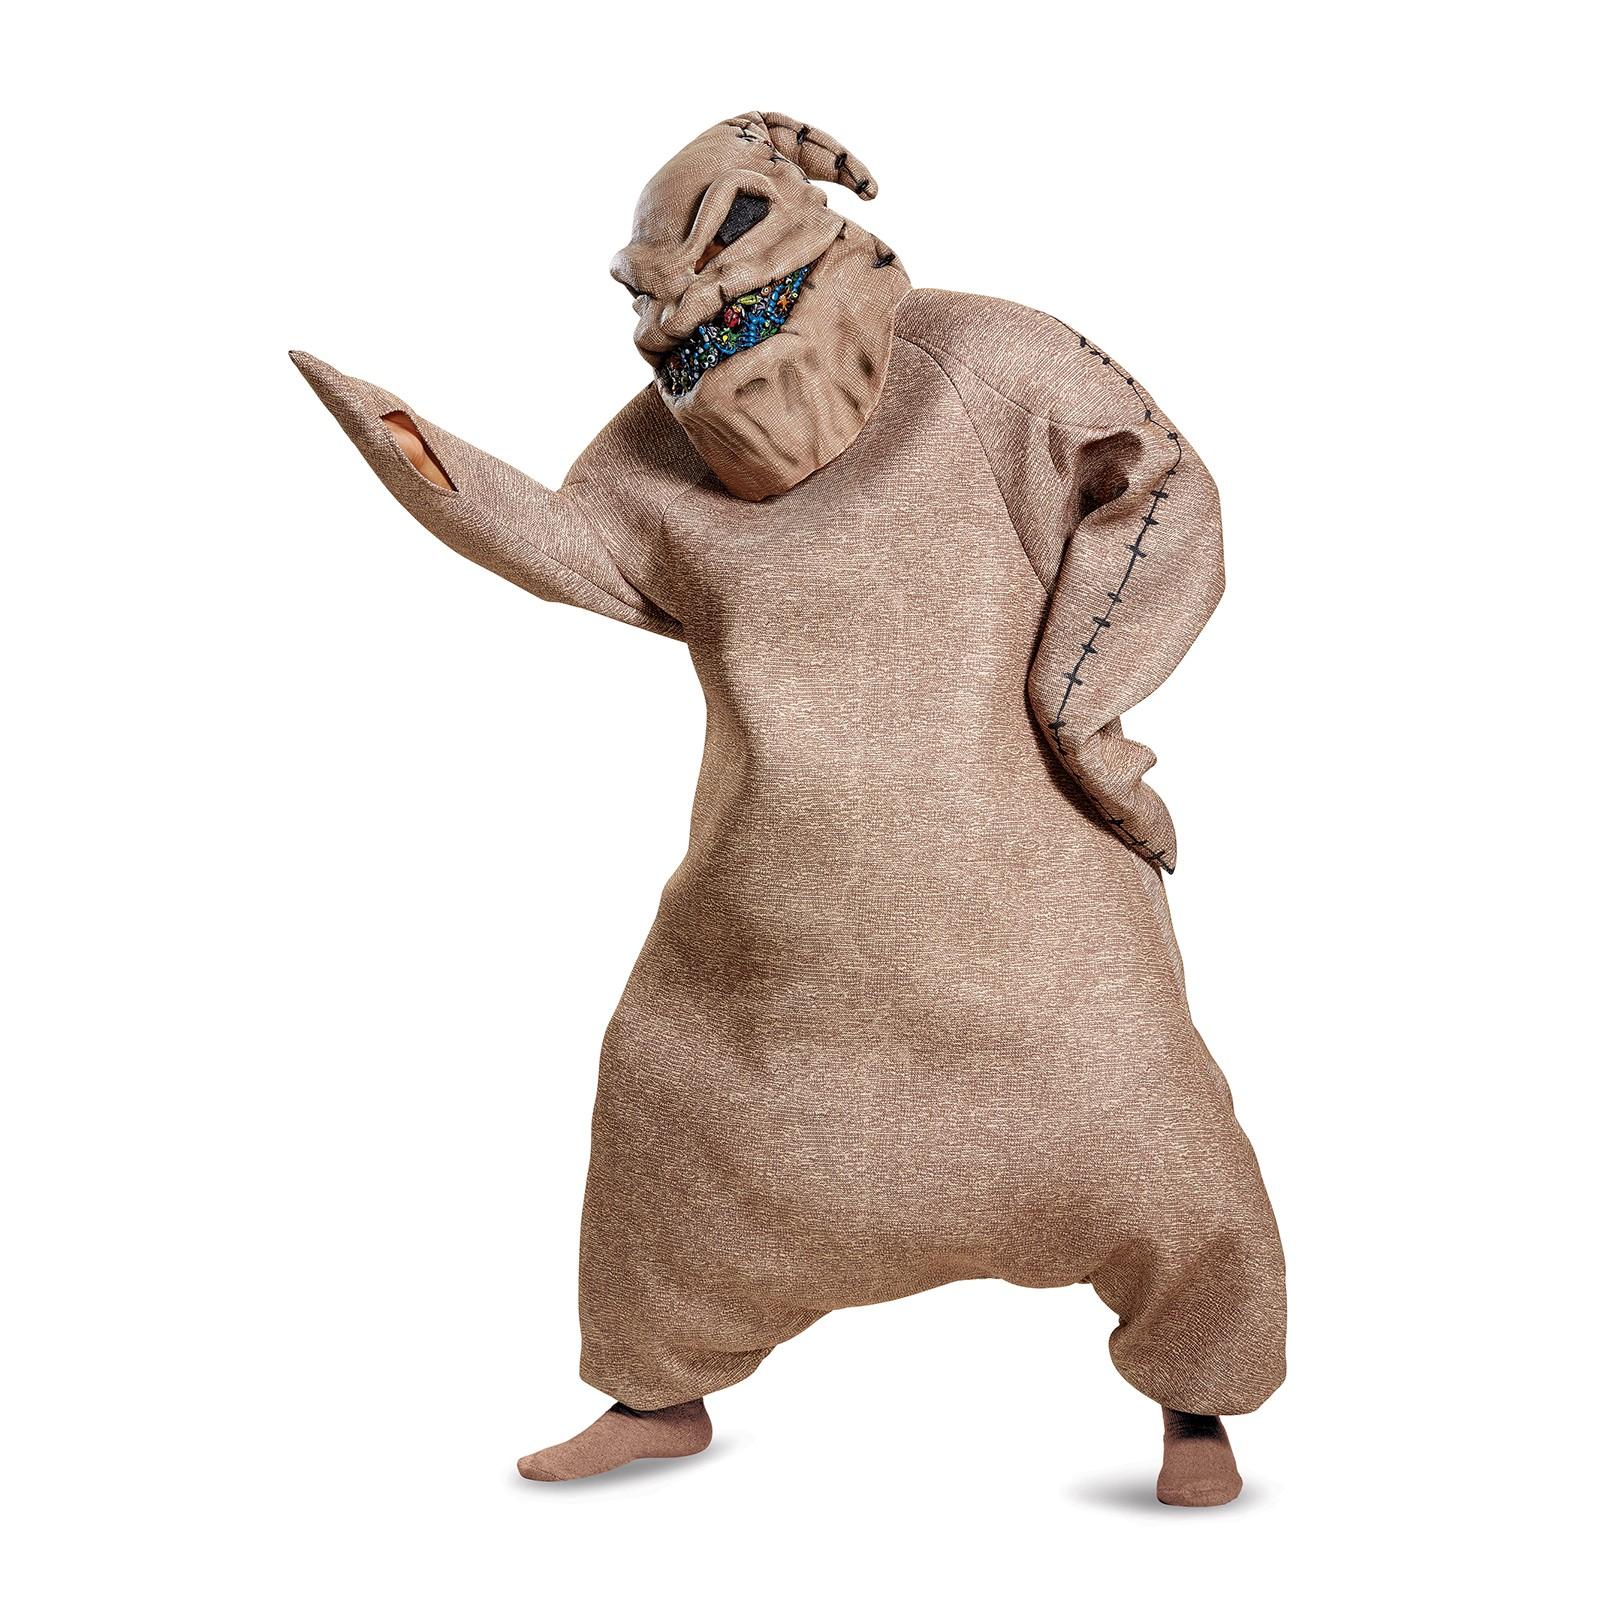 Oogie Boogie Prestige Adult Costume